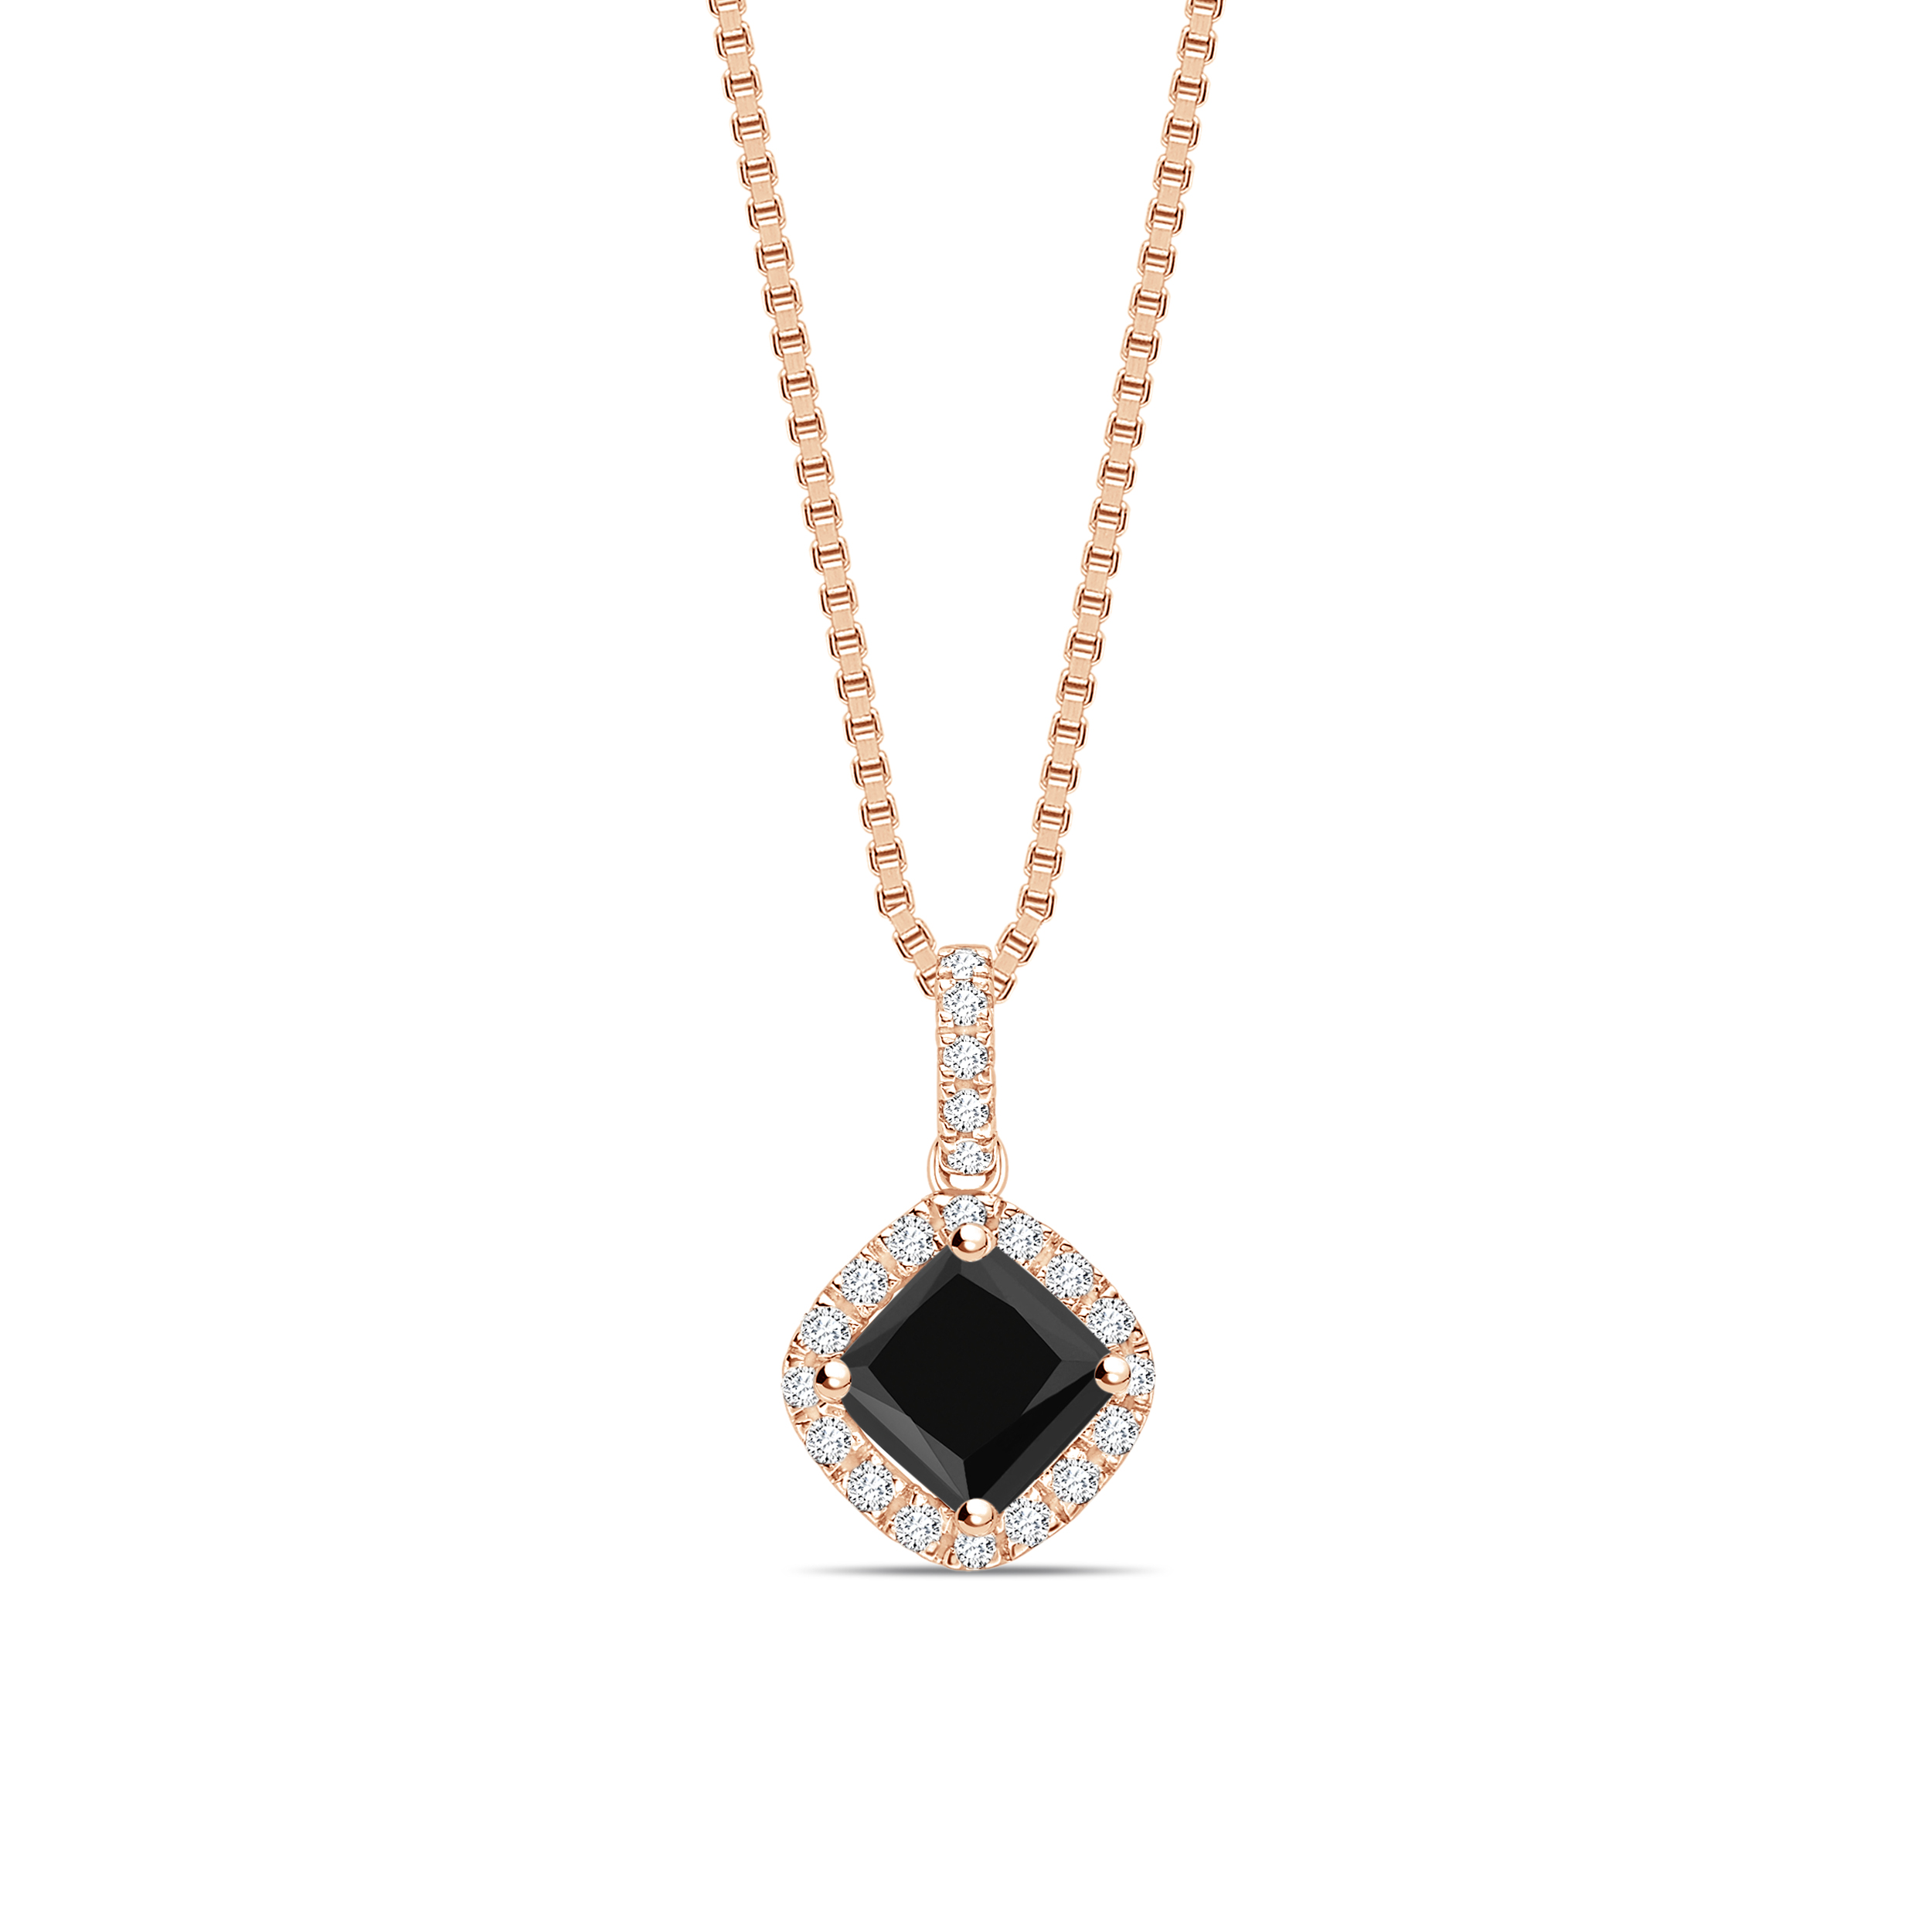 Smooth Corner Princess Cut Halo Black Diamond Solitaire Pendants Necklace